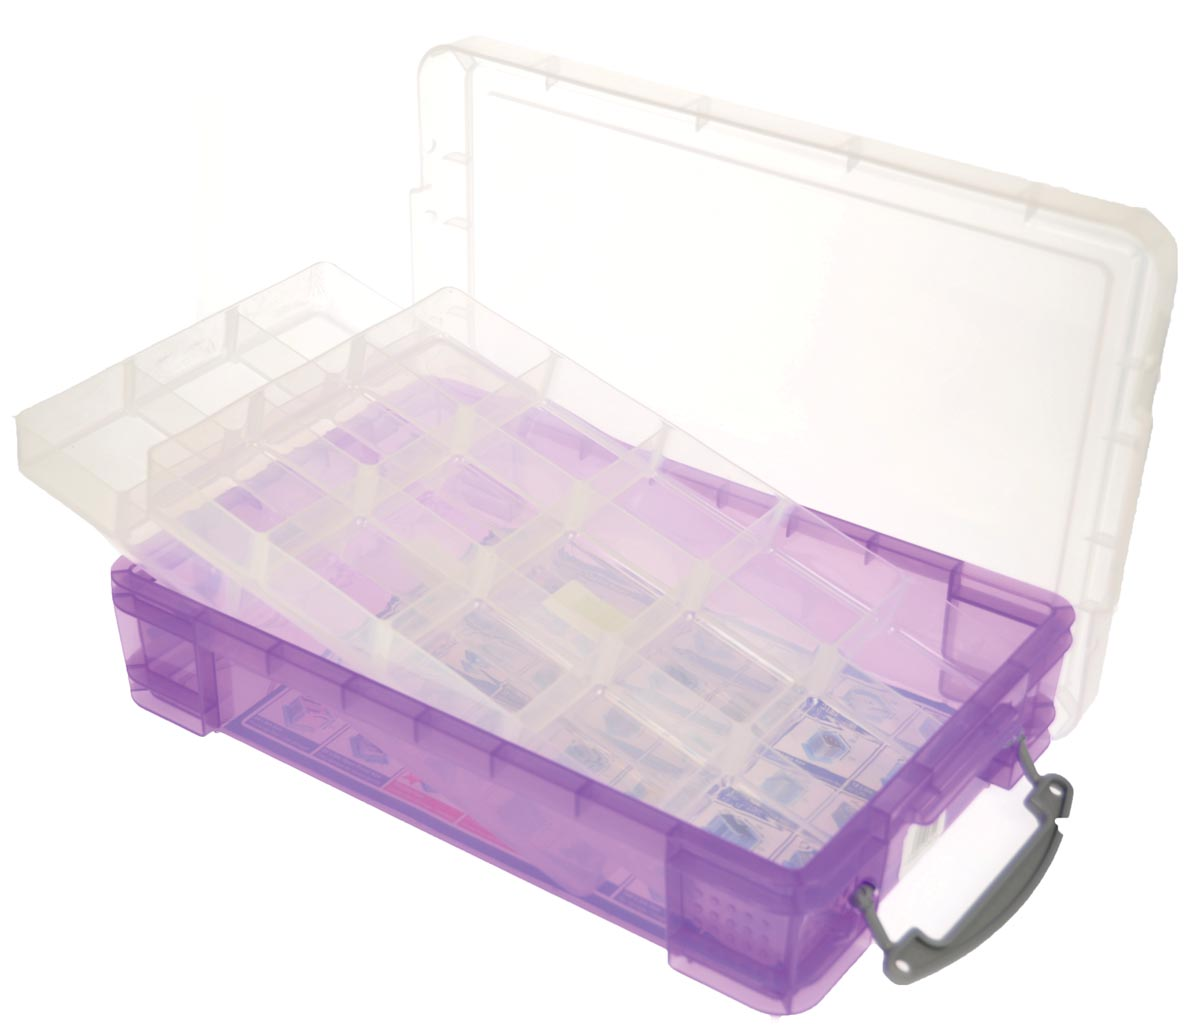 Really Useful Box opbergdoos 4 liter met 2 dividers, transparant paars